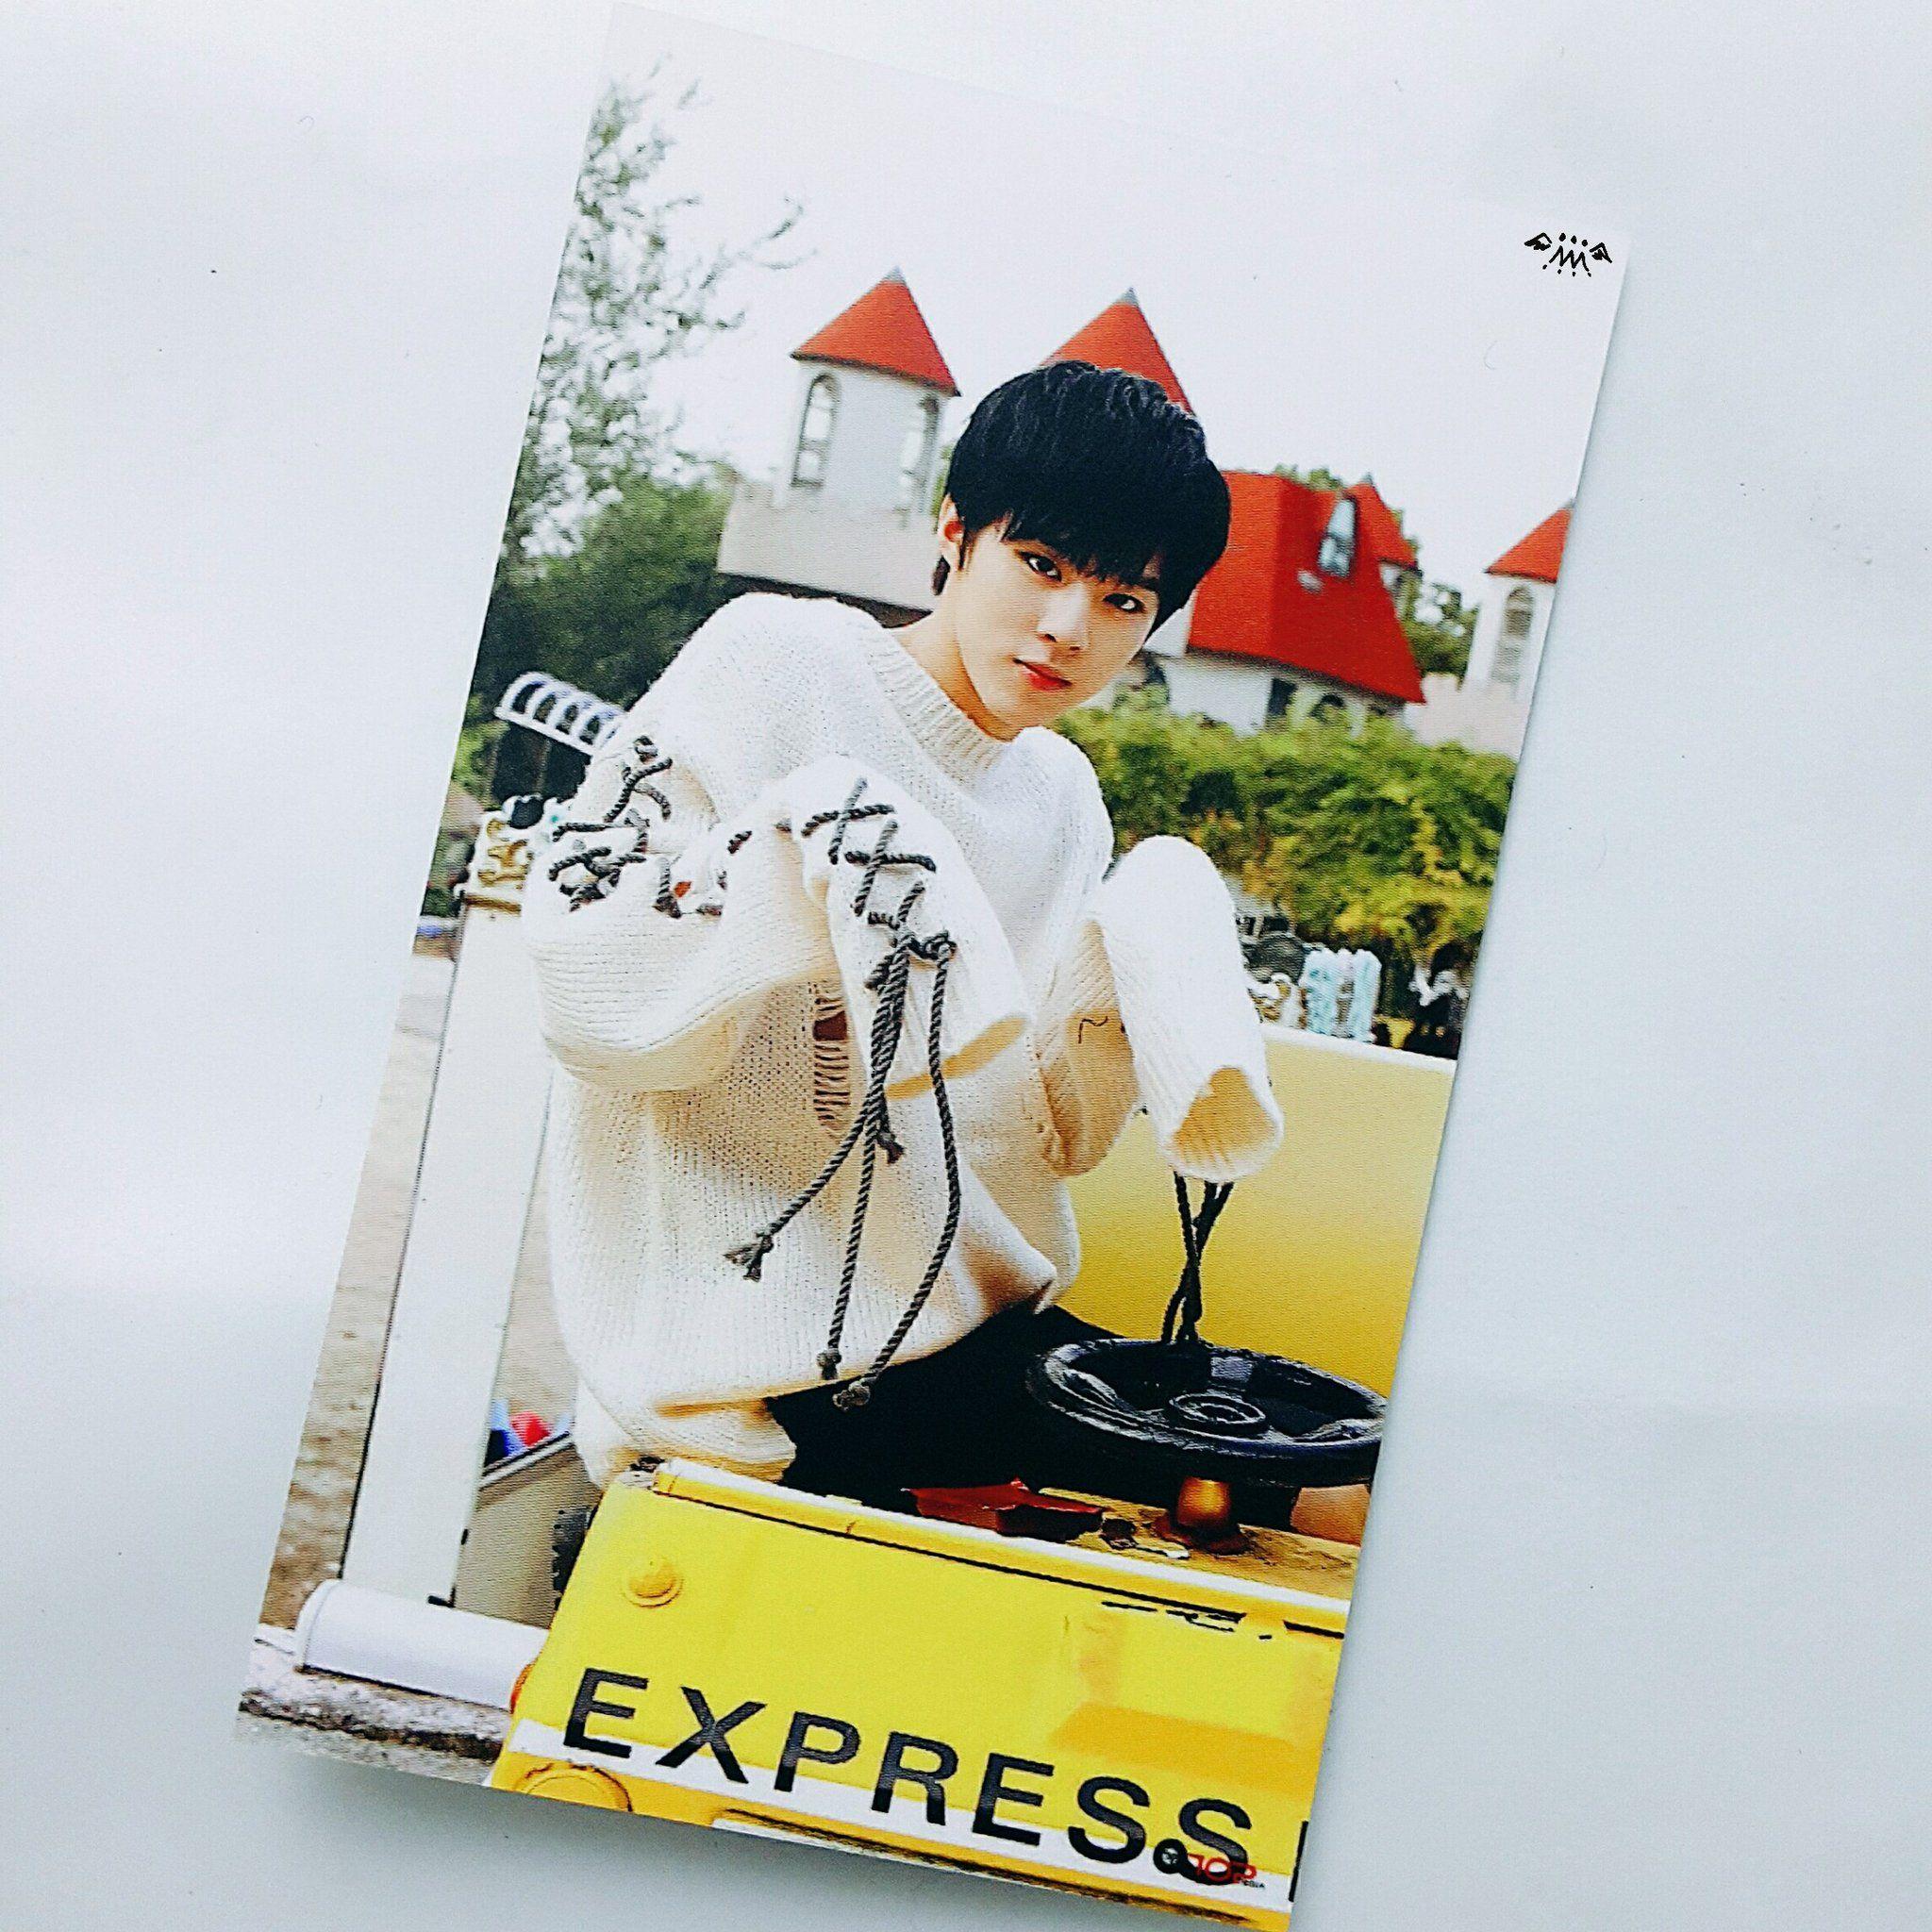 UP10TION Wooshin Photocard |  © The little prince #UP10TION #업텐션 #Wooshin #우신